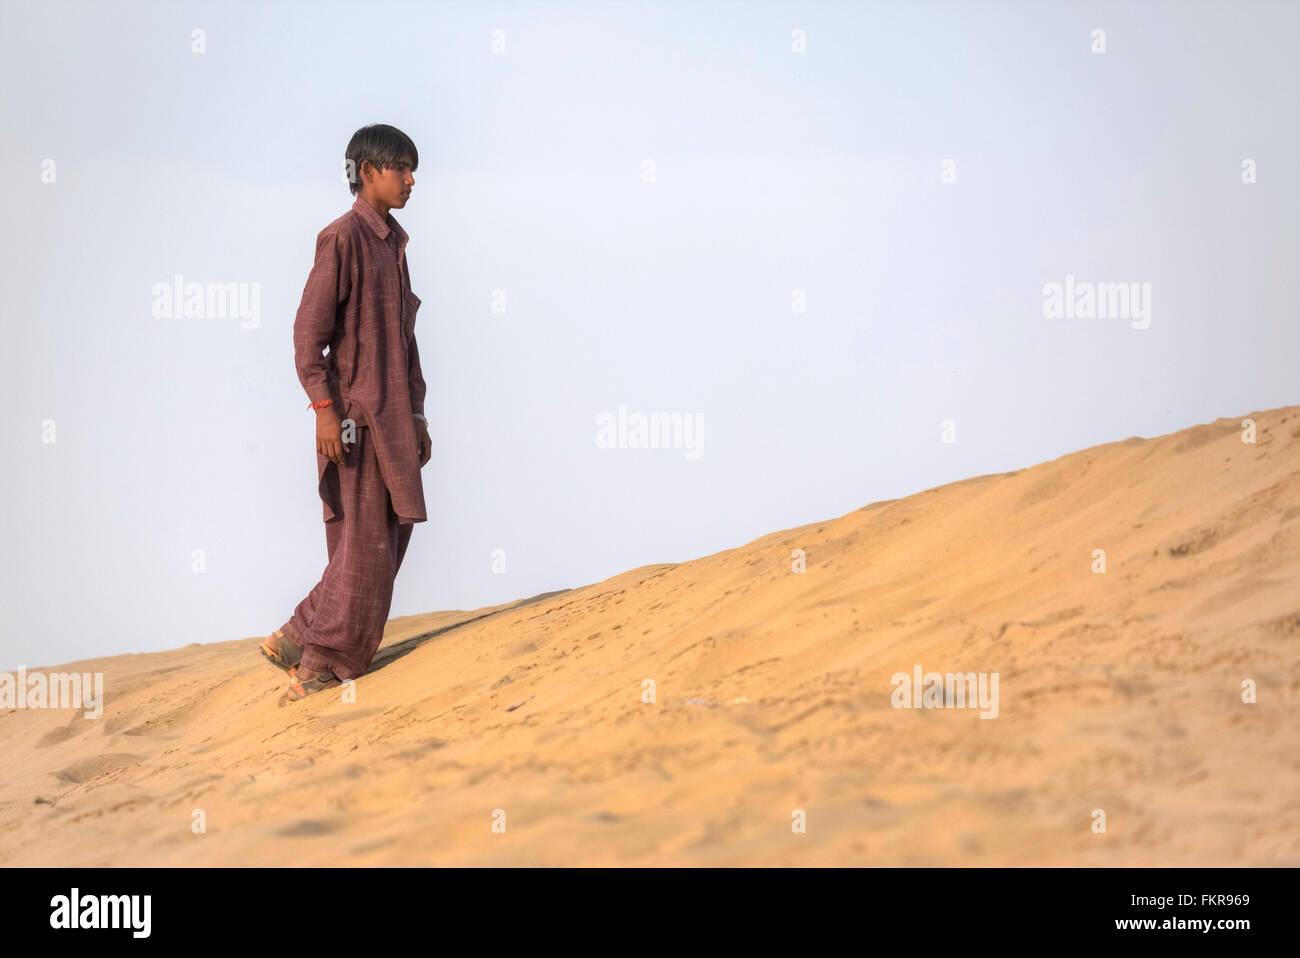 Ragazzo di nomadi del deserto di Thar, Rajasthan, India Immagini Stock